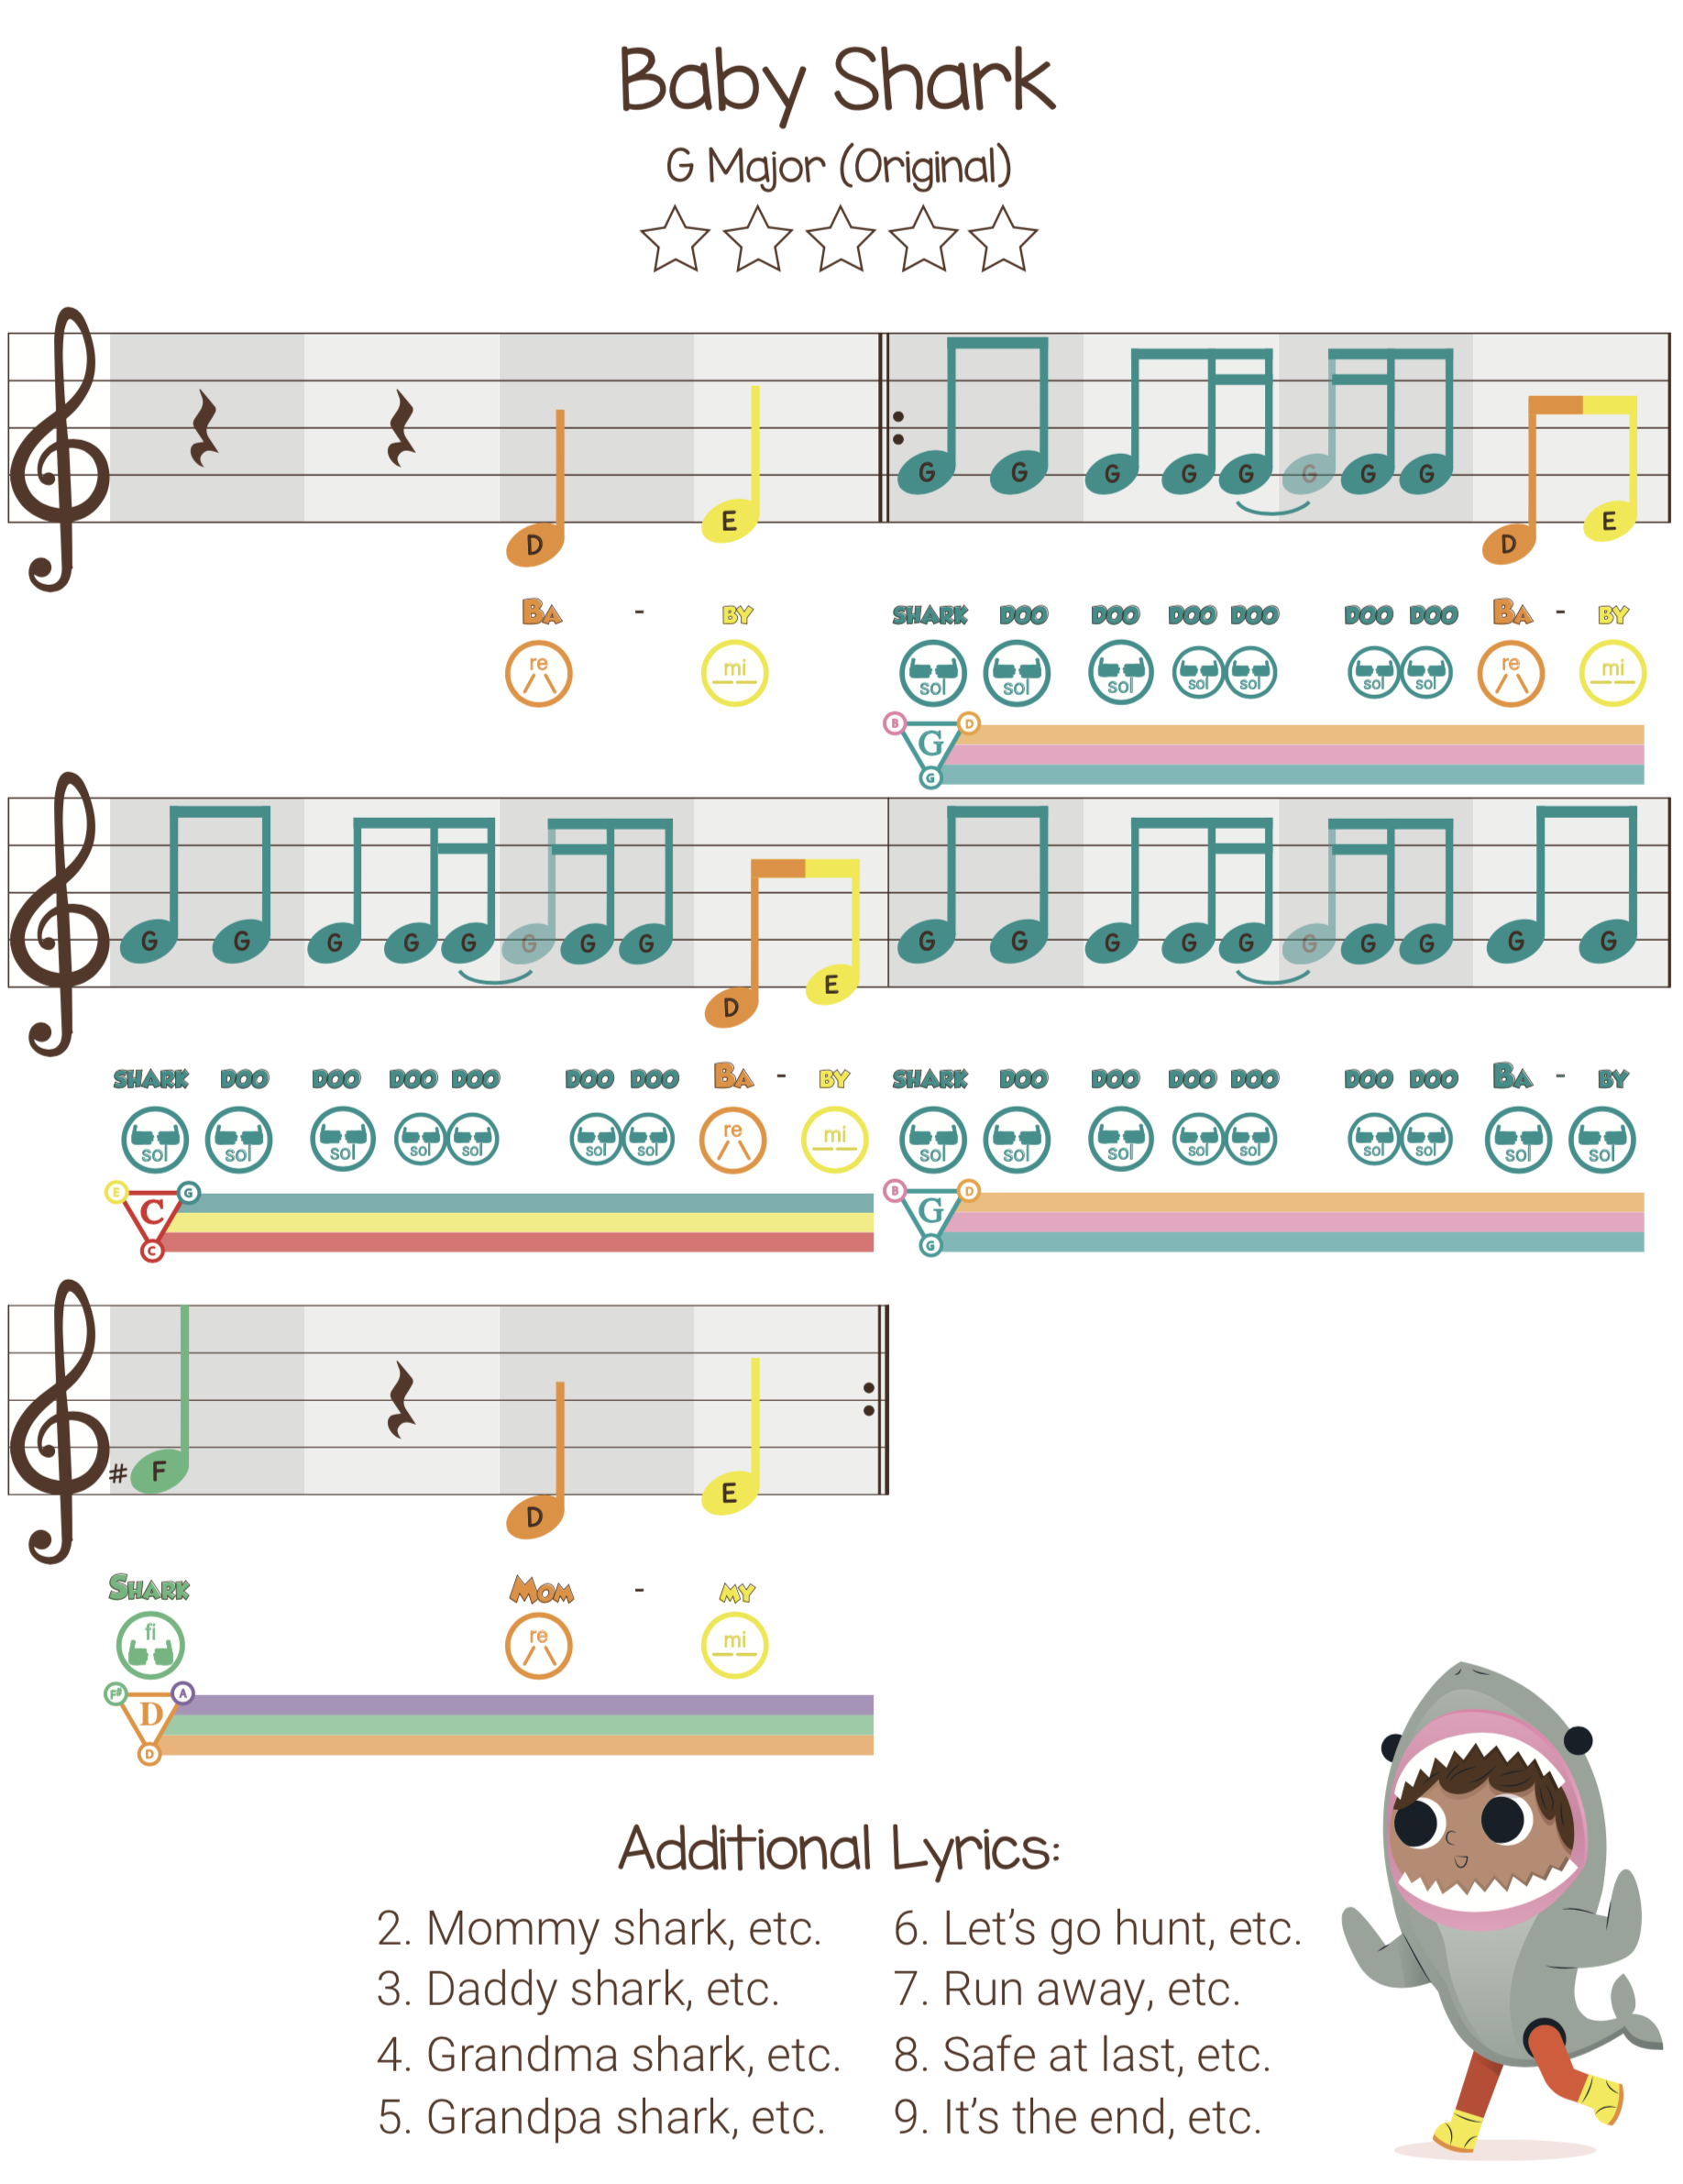 Baby Shark Music Lesson Sing Hand Sign Play W The Melody From Baby Shark Baby Shark Music Recorder Sheet Music Trumpet Sheet Music